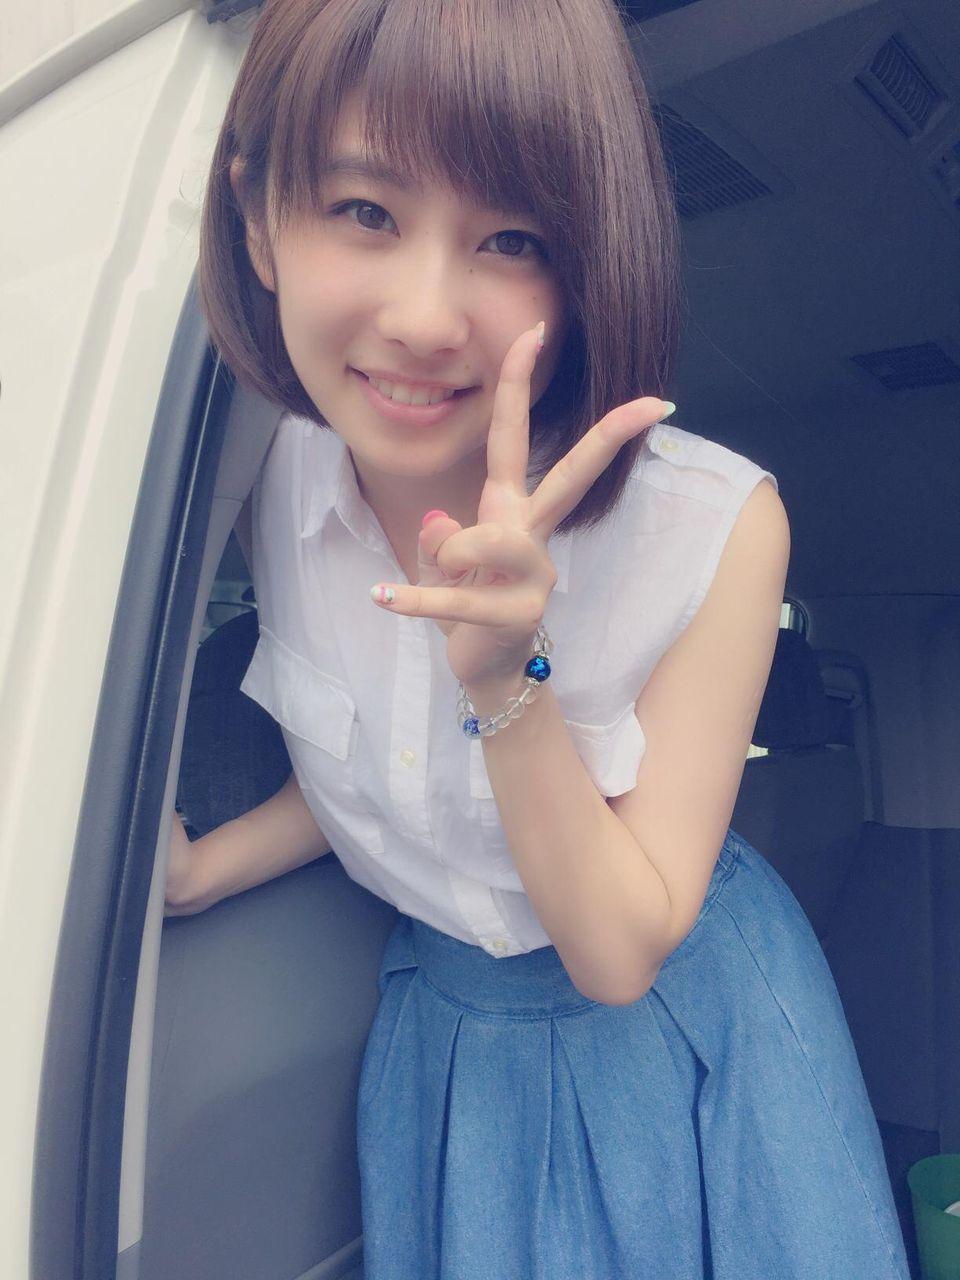 岡田彩花 画像 : 【AKB48】岡田...